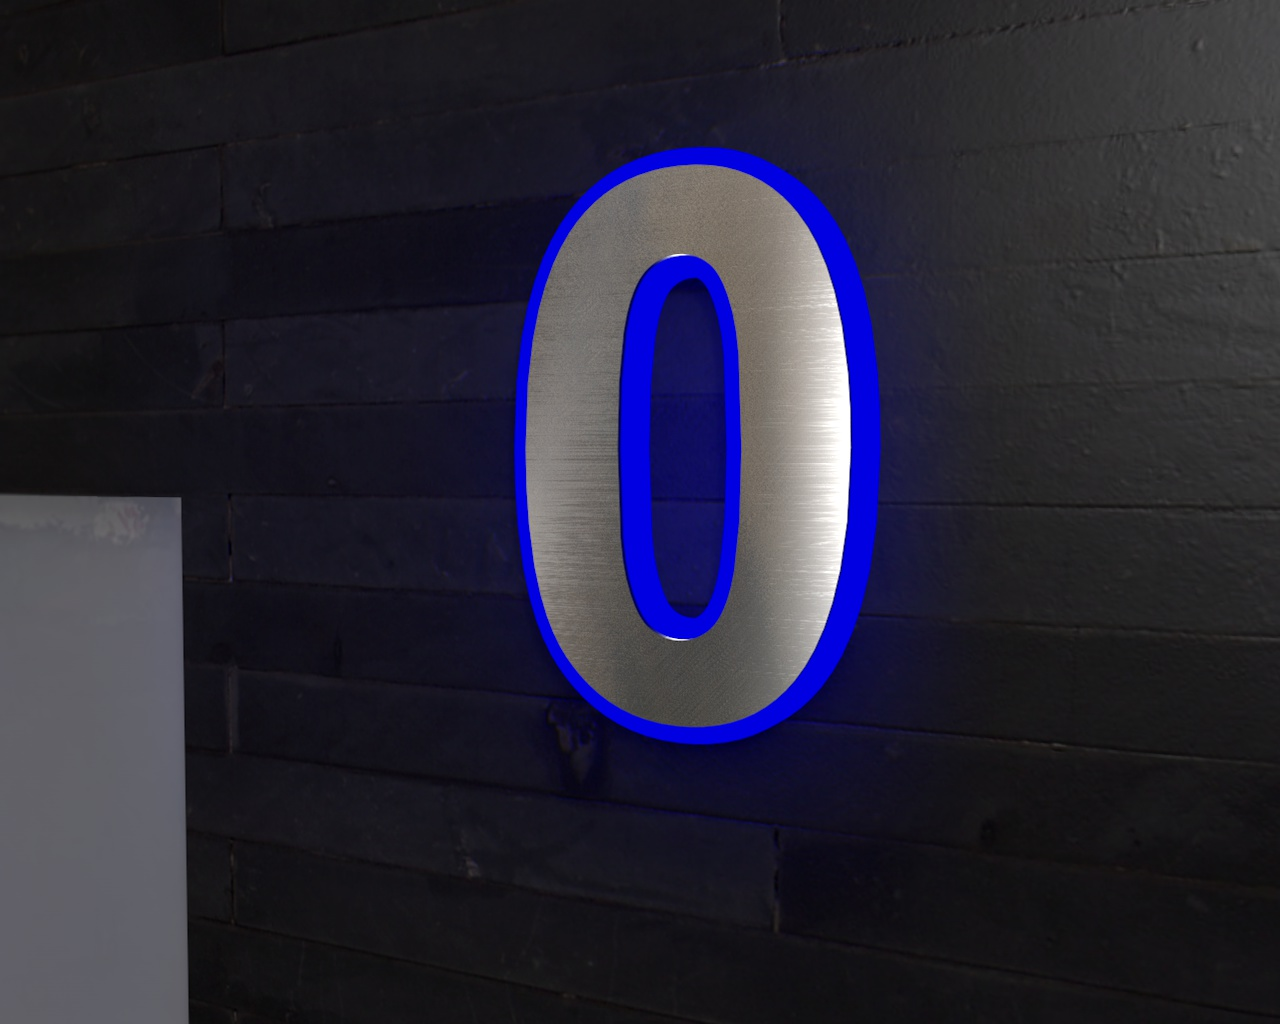 edelstahl hausnummer beleuchtete led edelstahl hausnummer 0. Black Bedroom Furniture Sets. Home Design Ideas